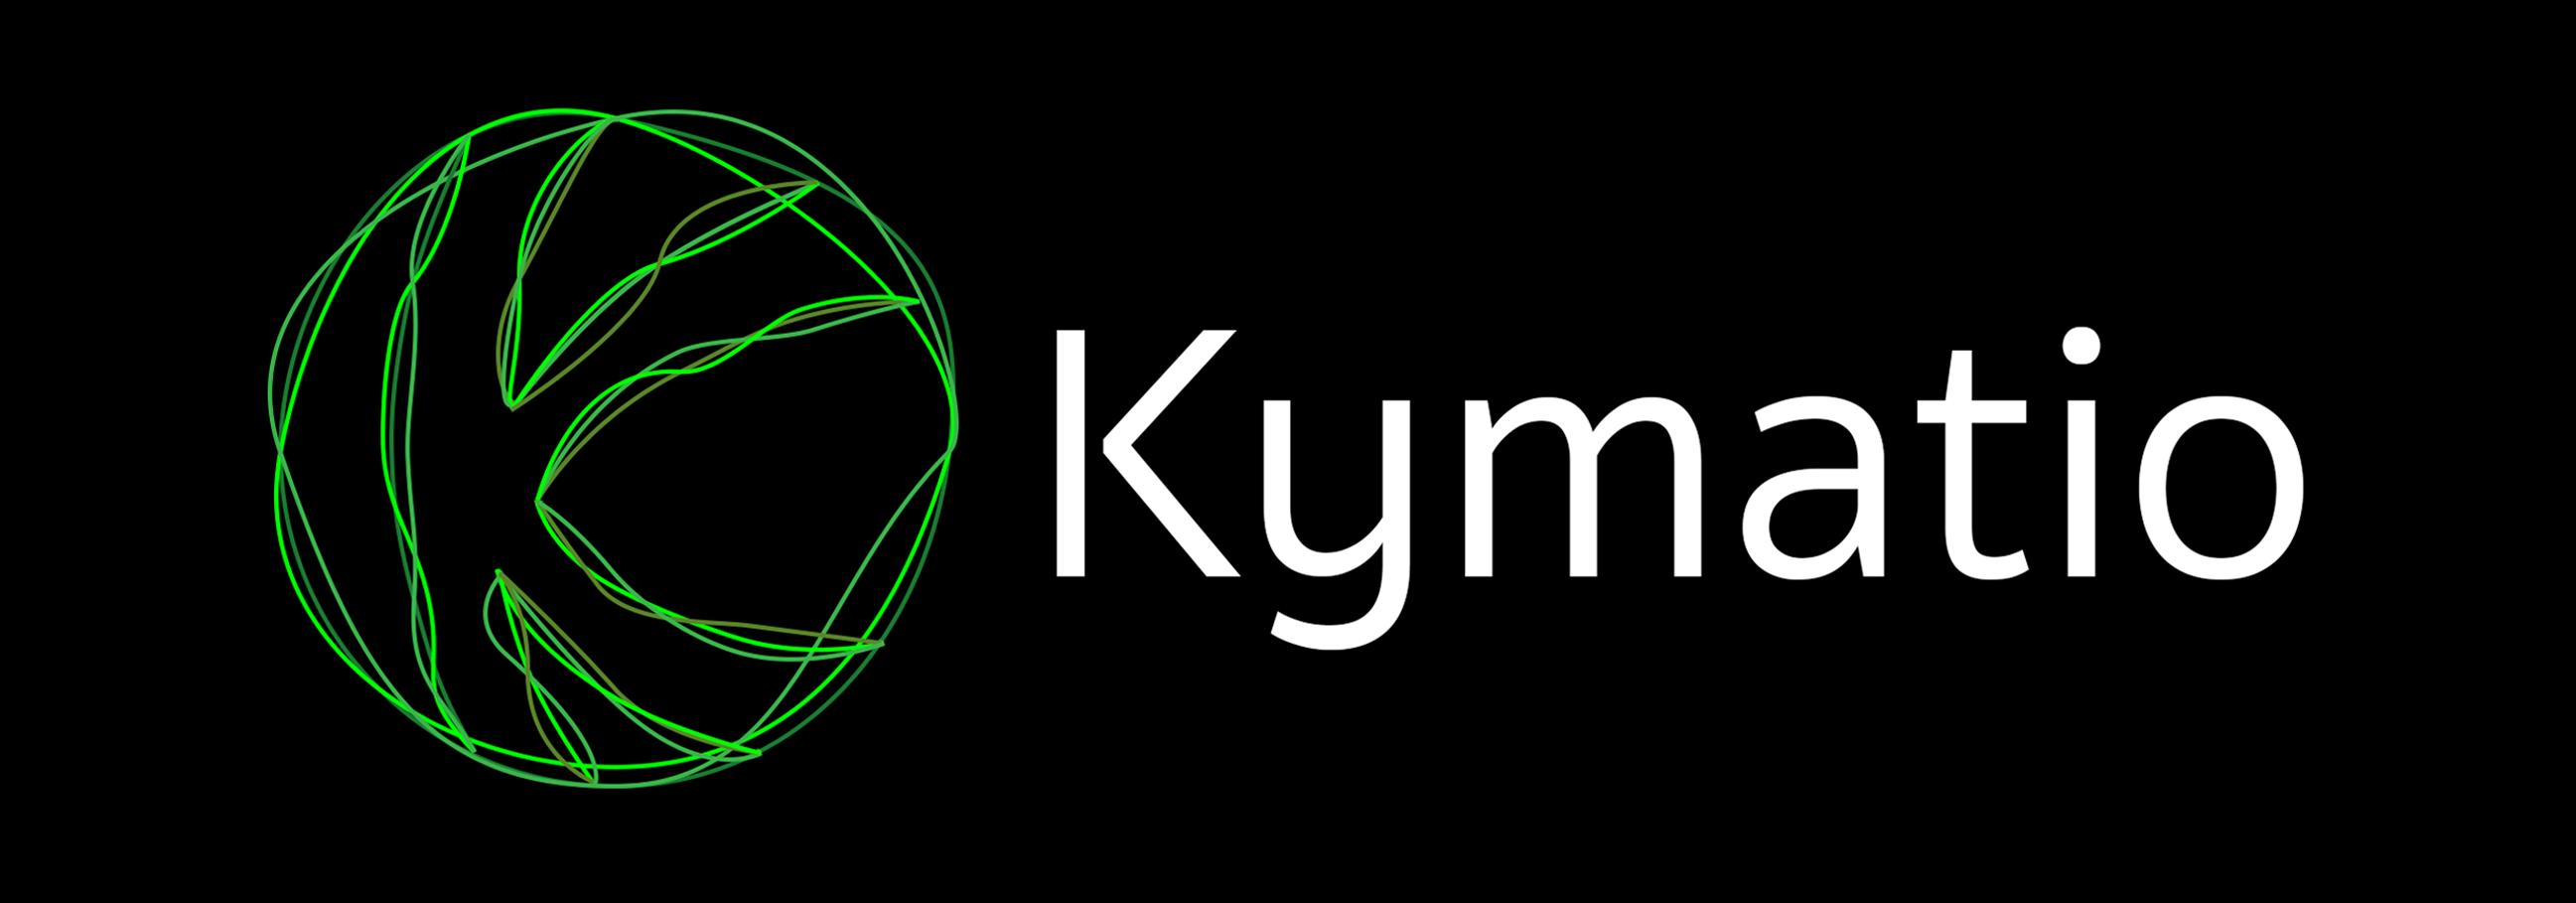 Kymatio logo Black BG